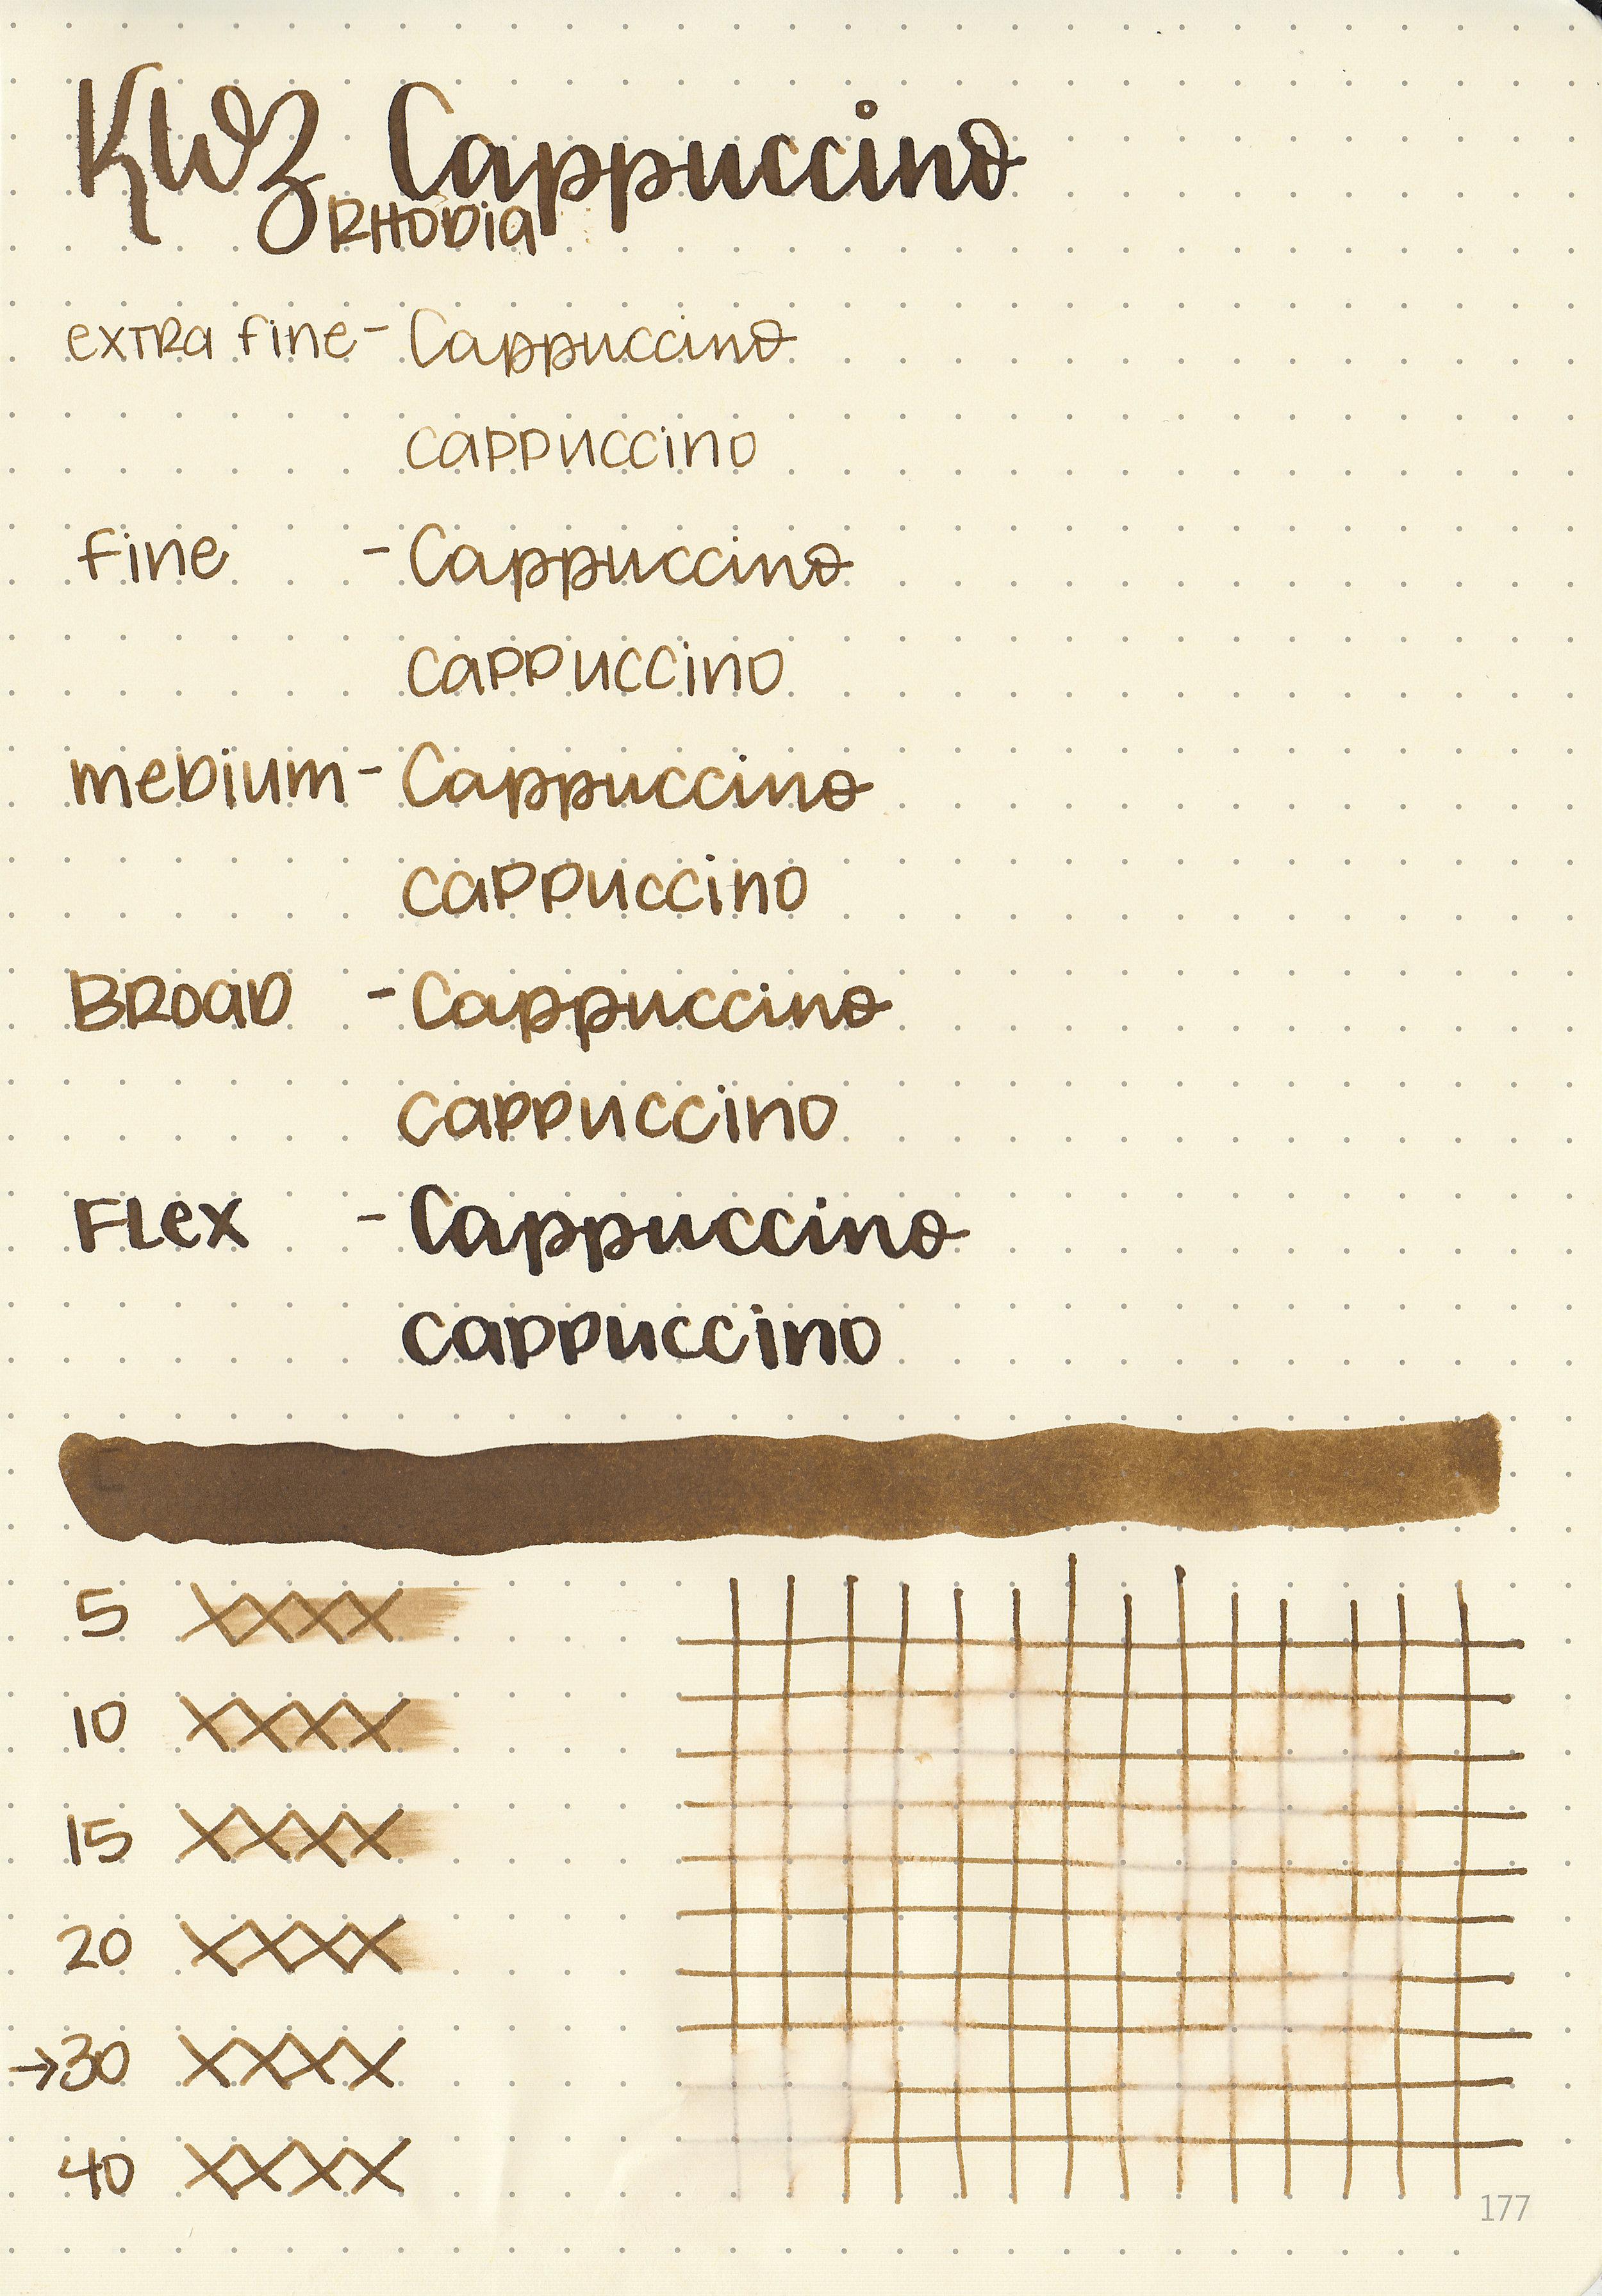 kwz-cappuccino-3.jpg